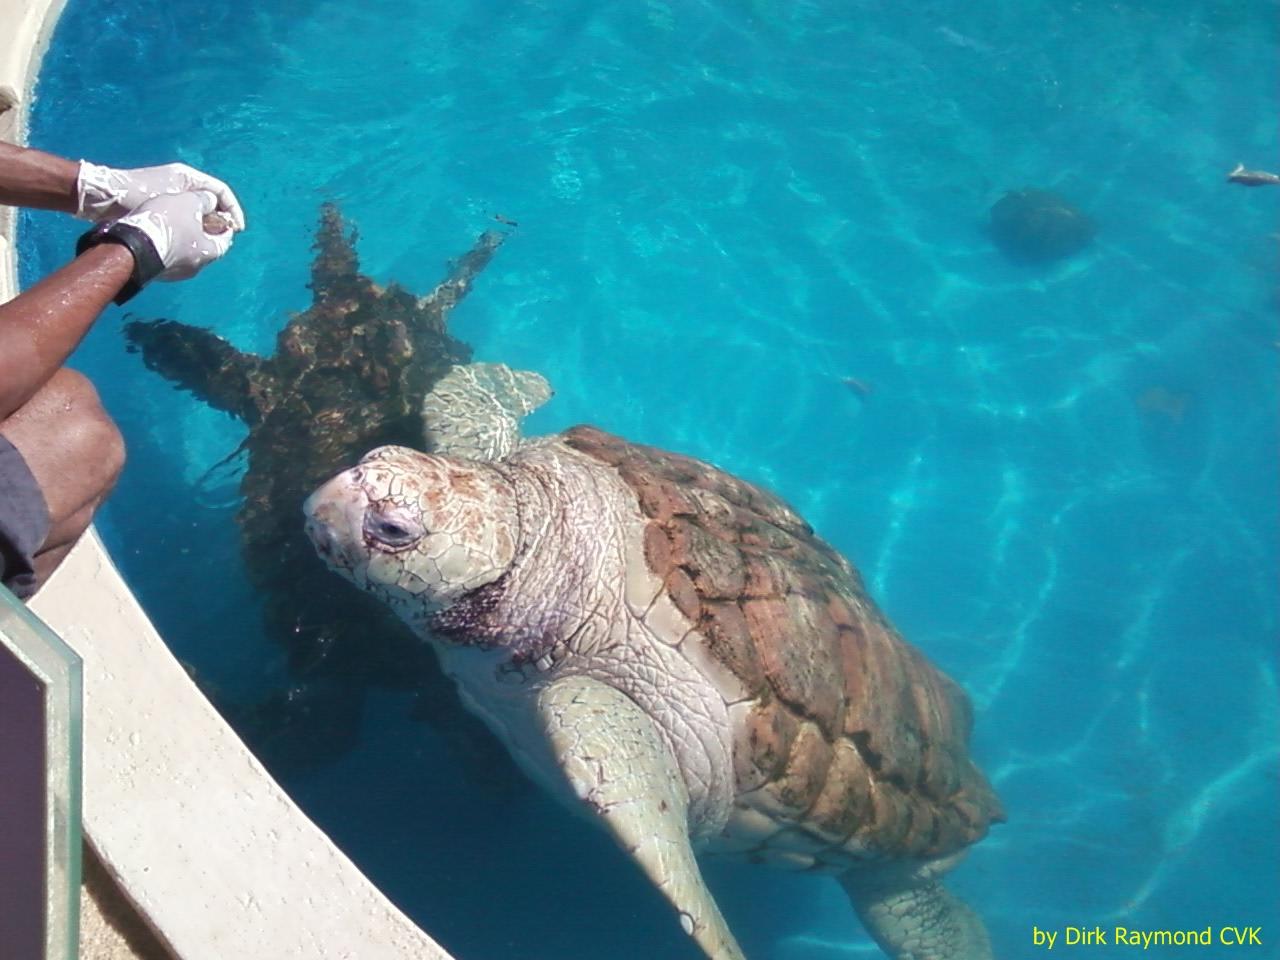 Tamar project: giant sea turtles